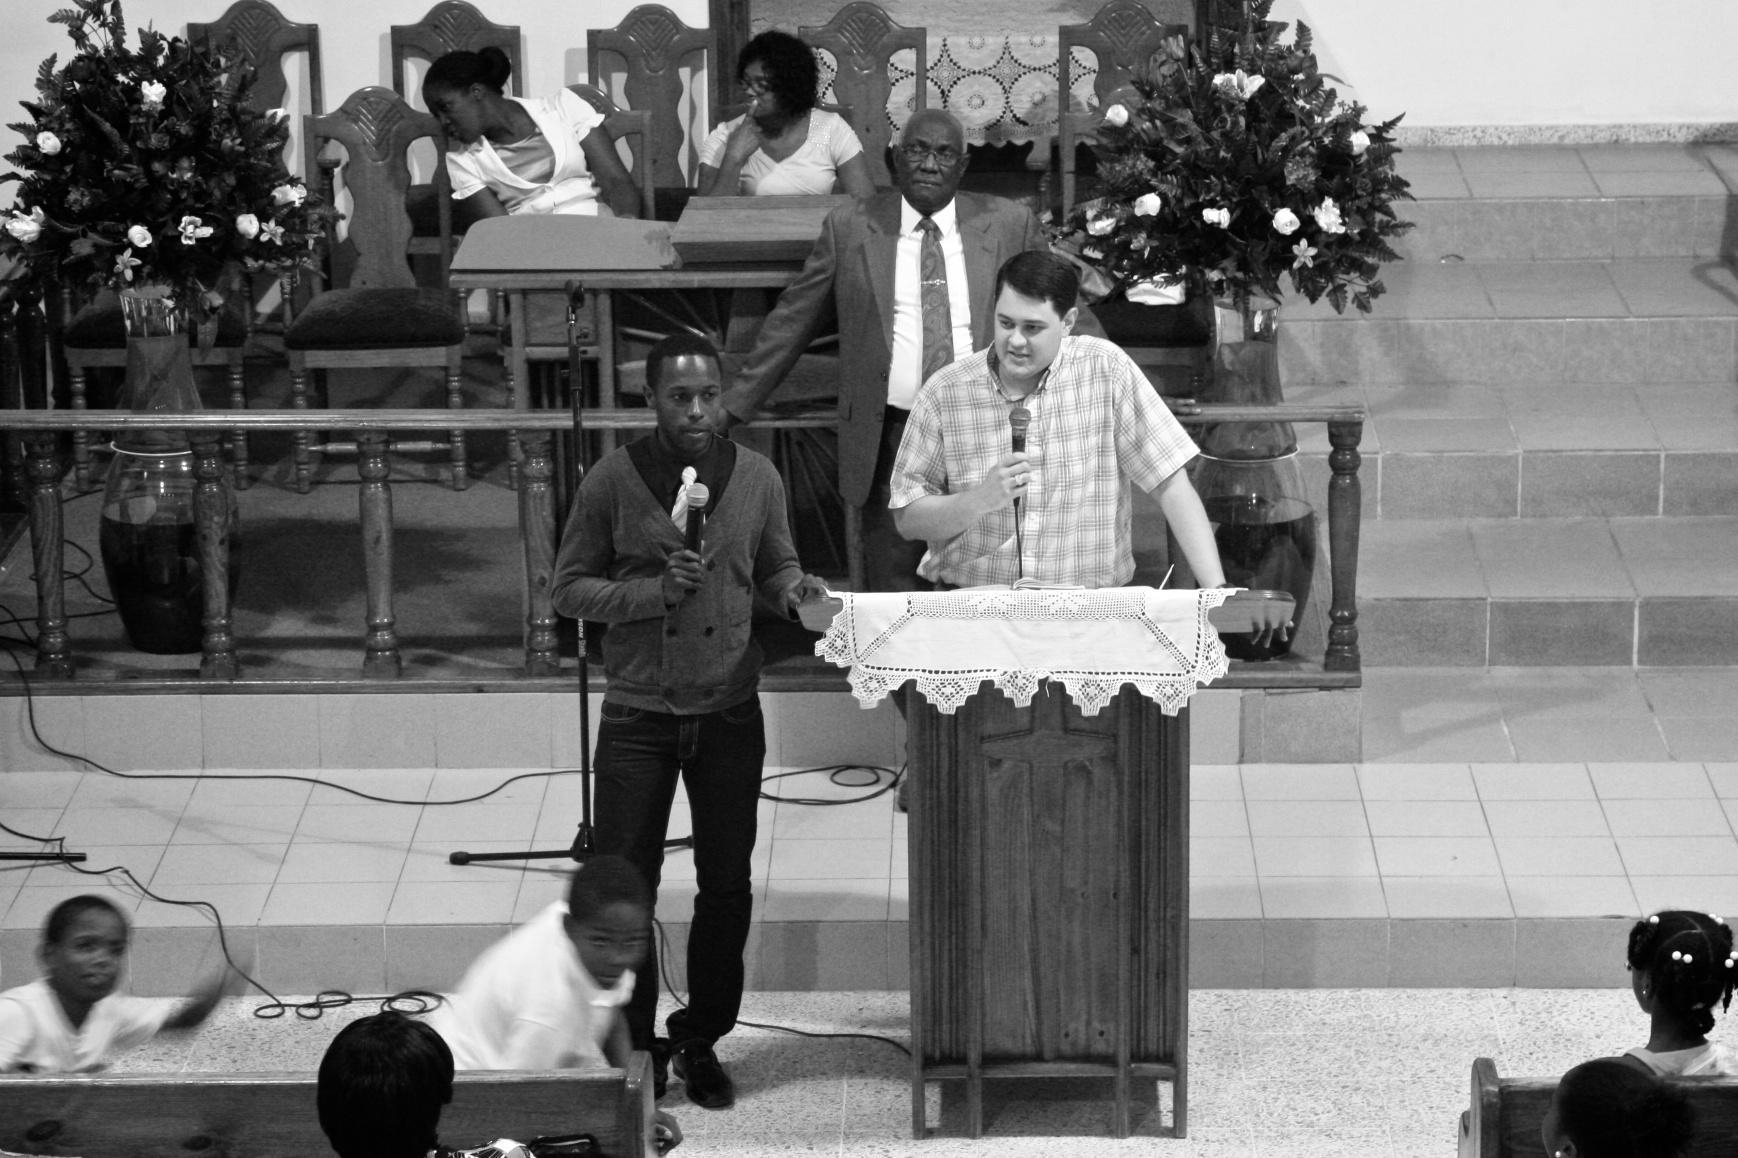 guest-preacher_8550890492_o.jpg